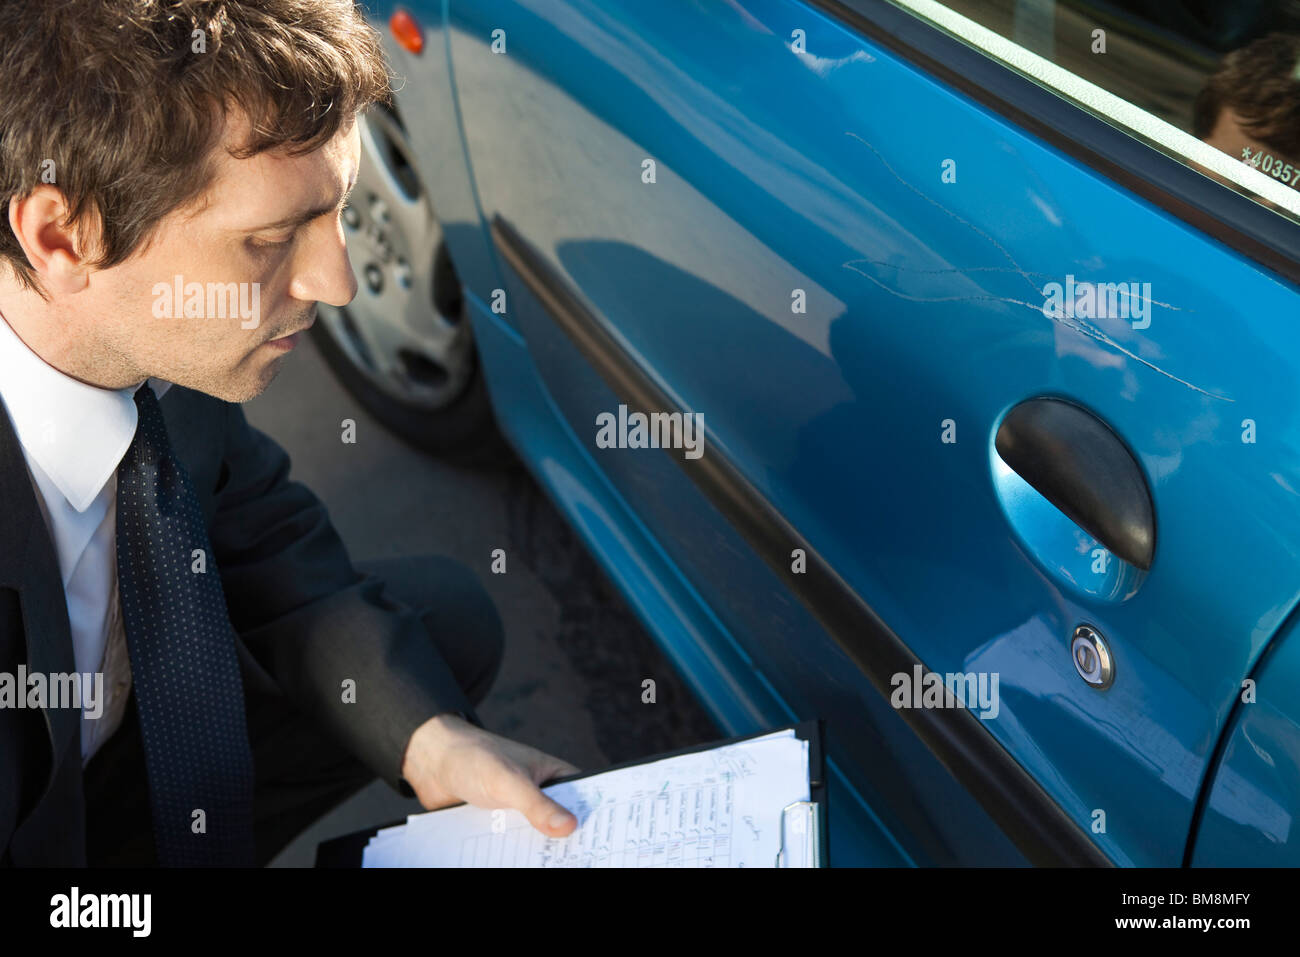 Insurance adjuster examining damage to car exterior - Stock Image